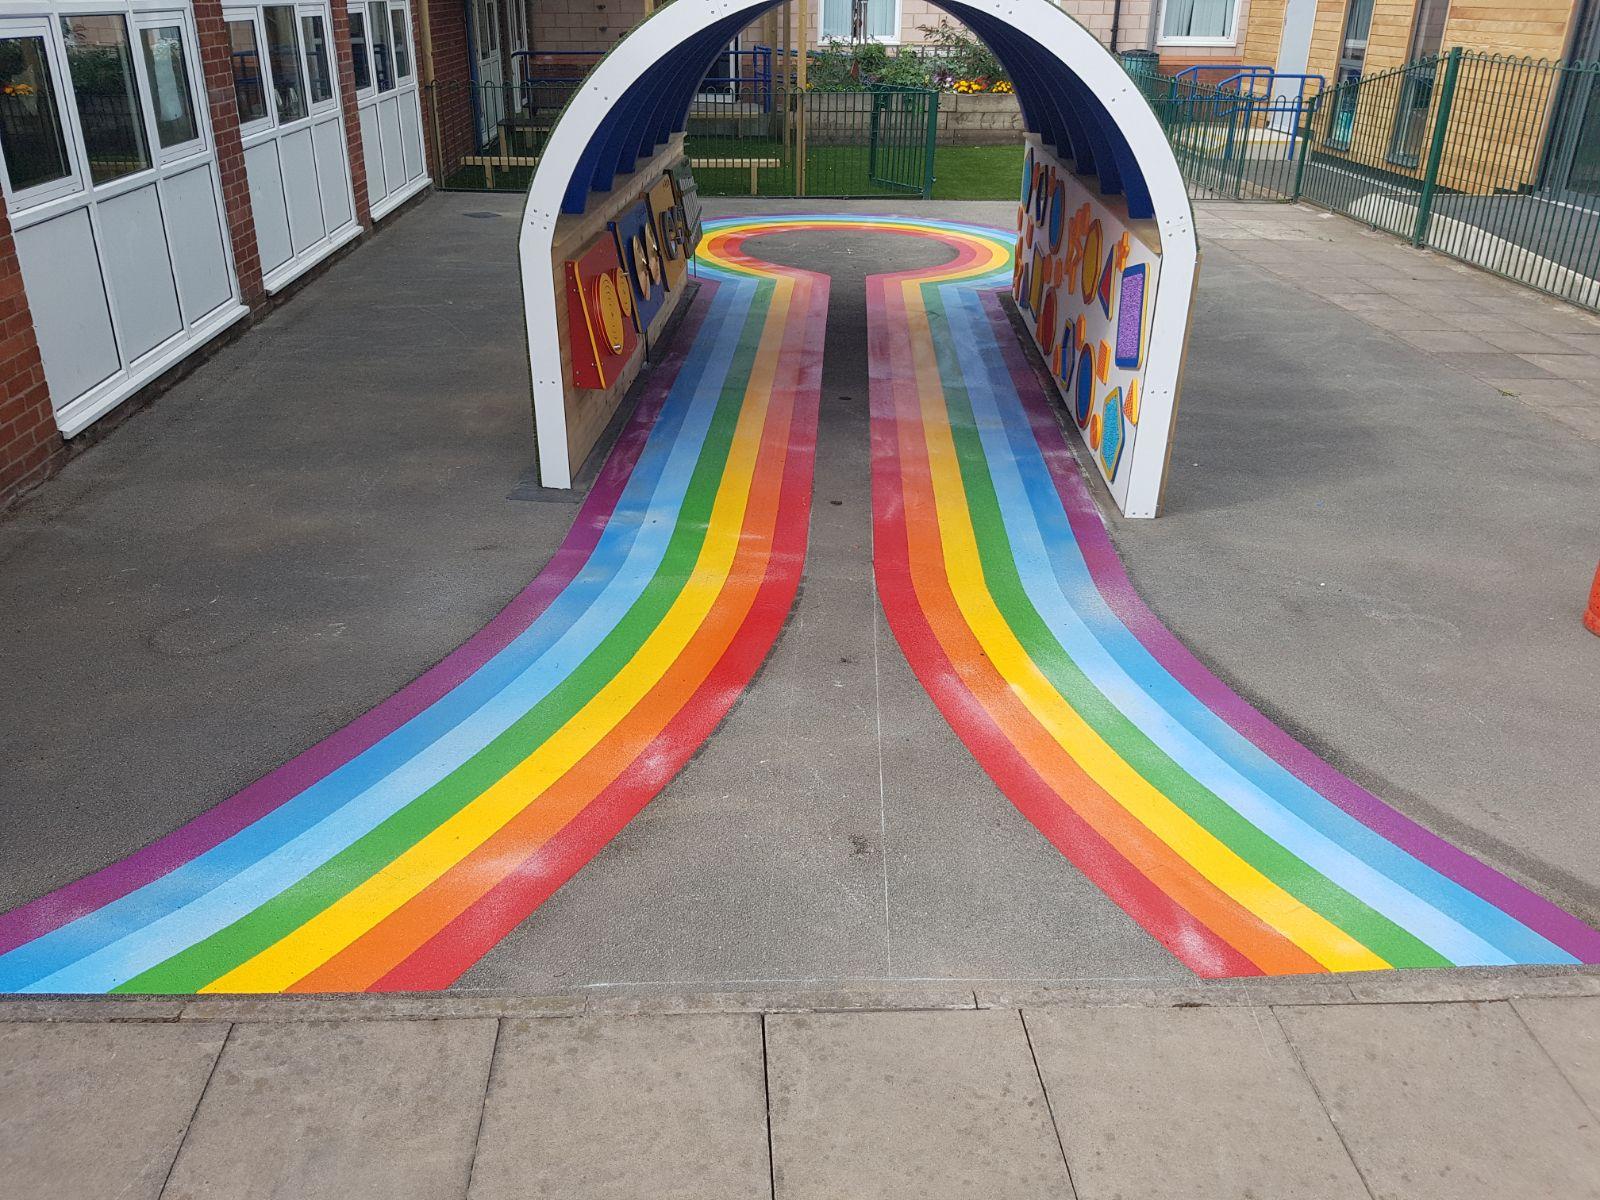 Playground Ideas for Schools